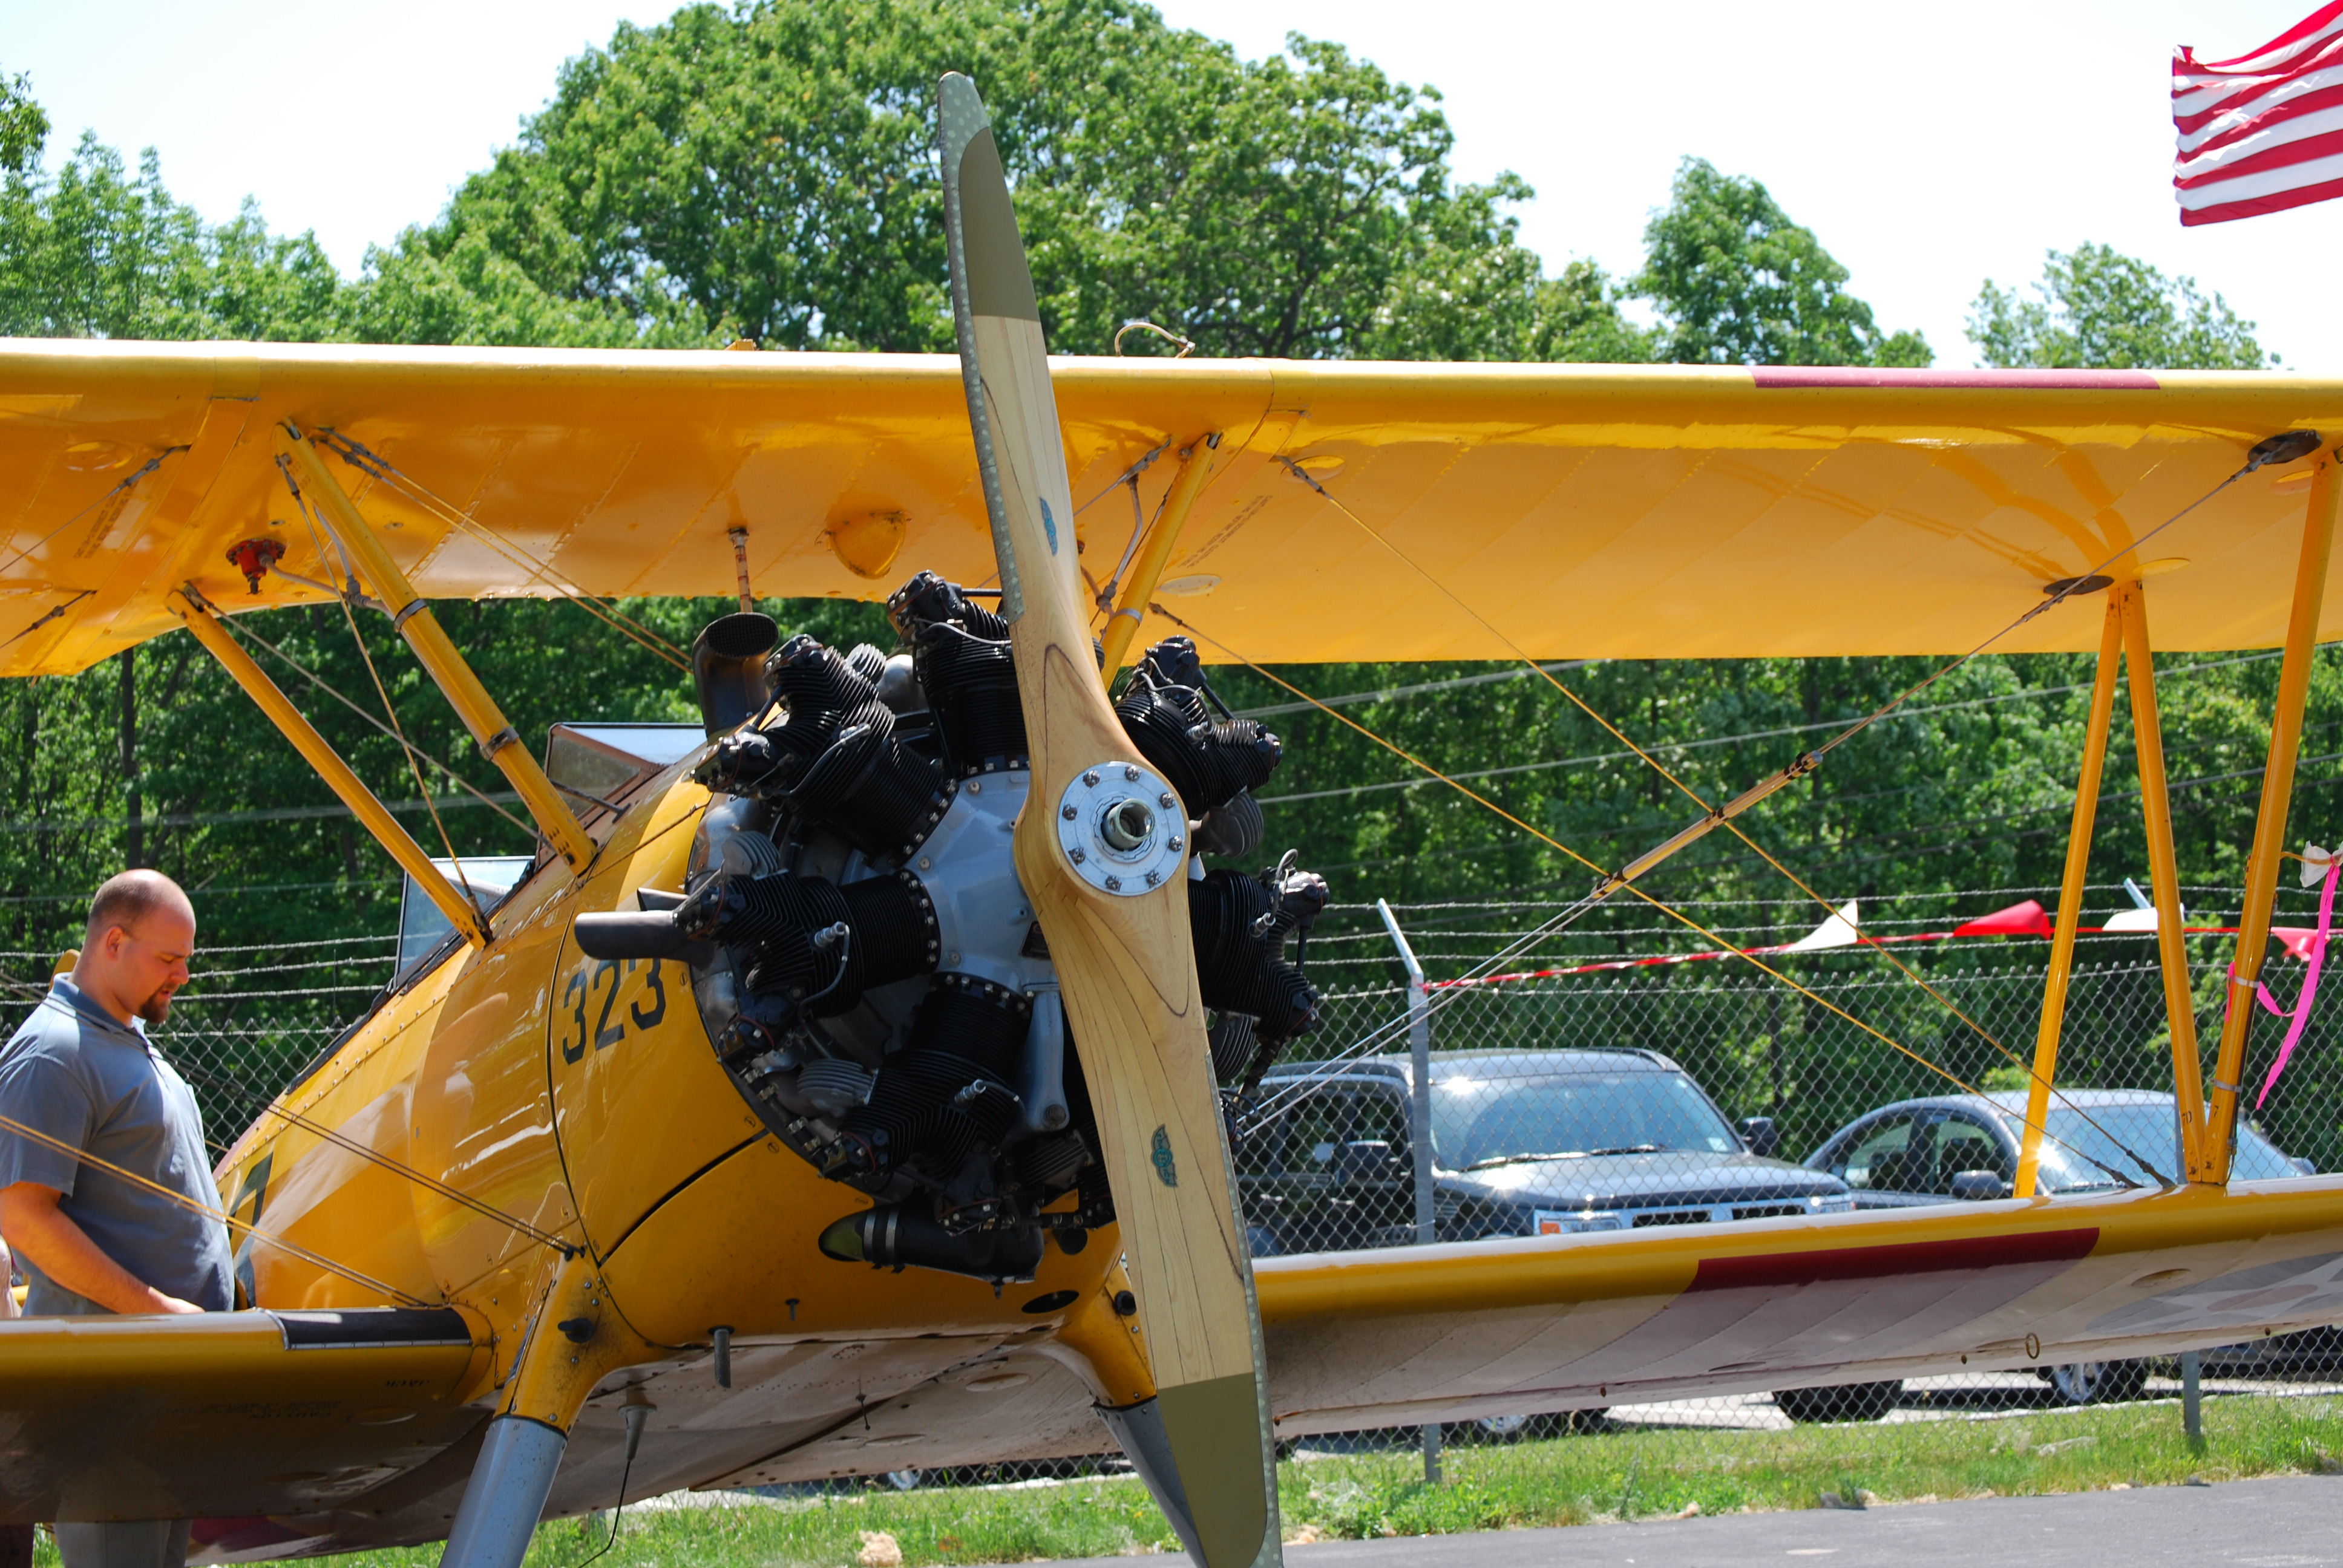 Airplane, Machine, Metallic, Propeller, Wing, HQ Photo